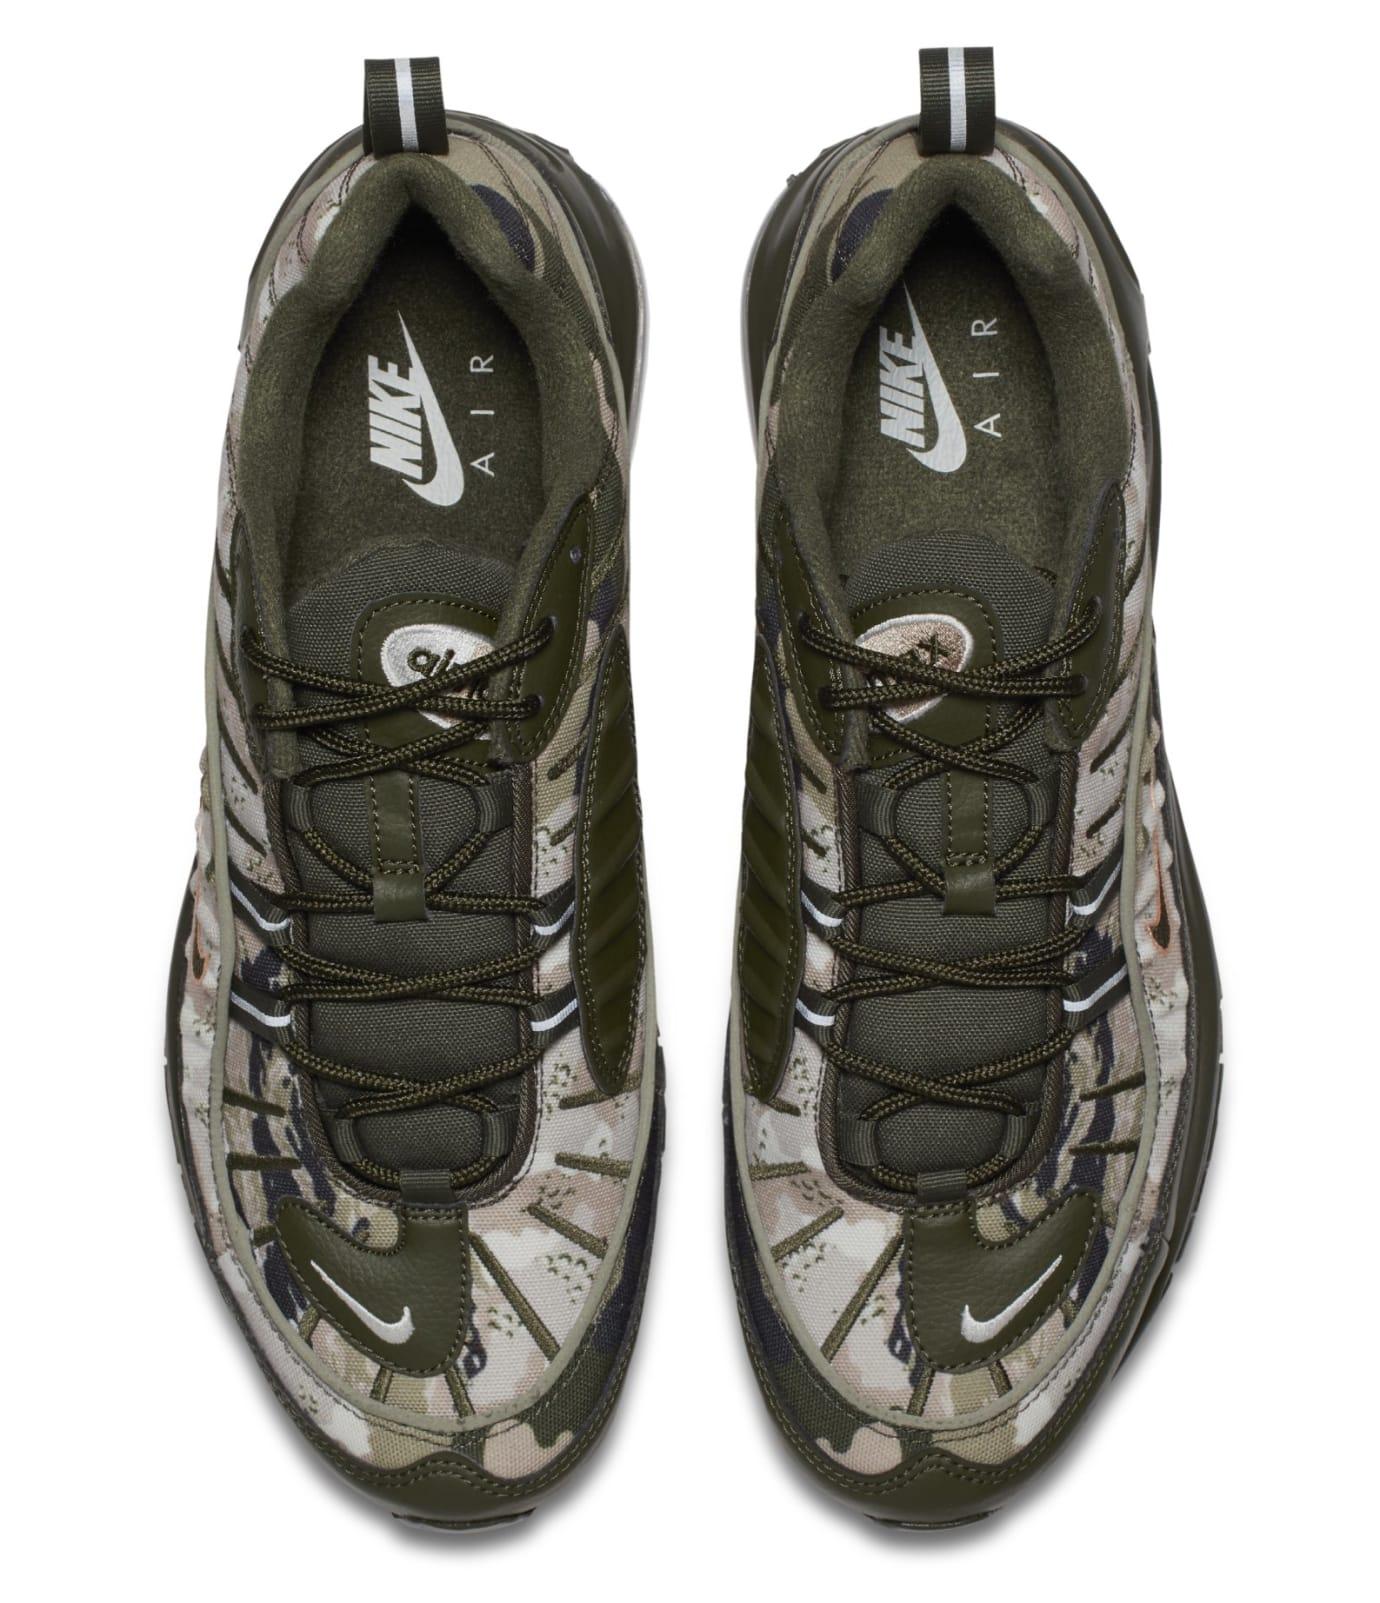 super popular 5a516 28ad4 Image via Nike Nike Air Max 98 Cargo KhakiSunset Tint AQ6165-300 (Top